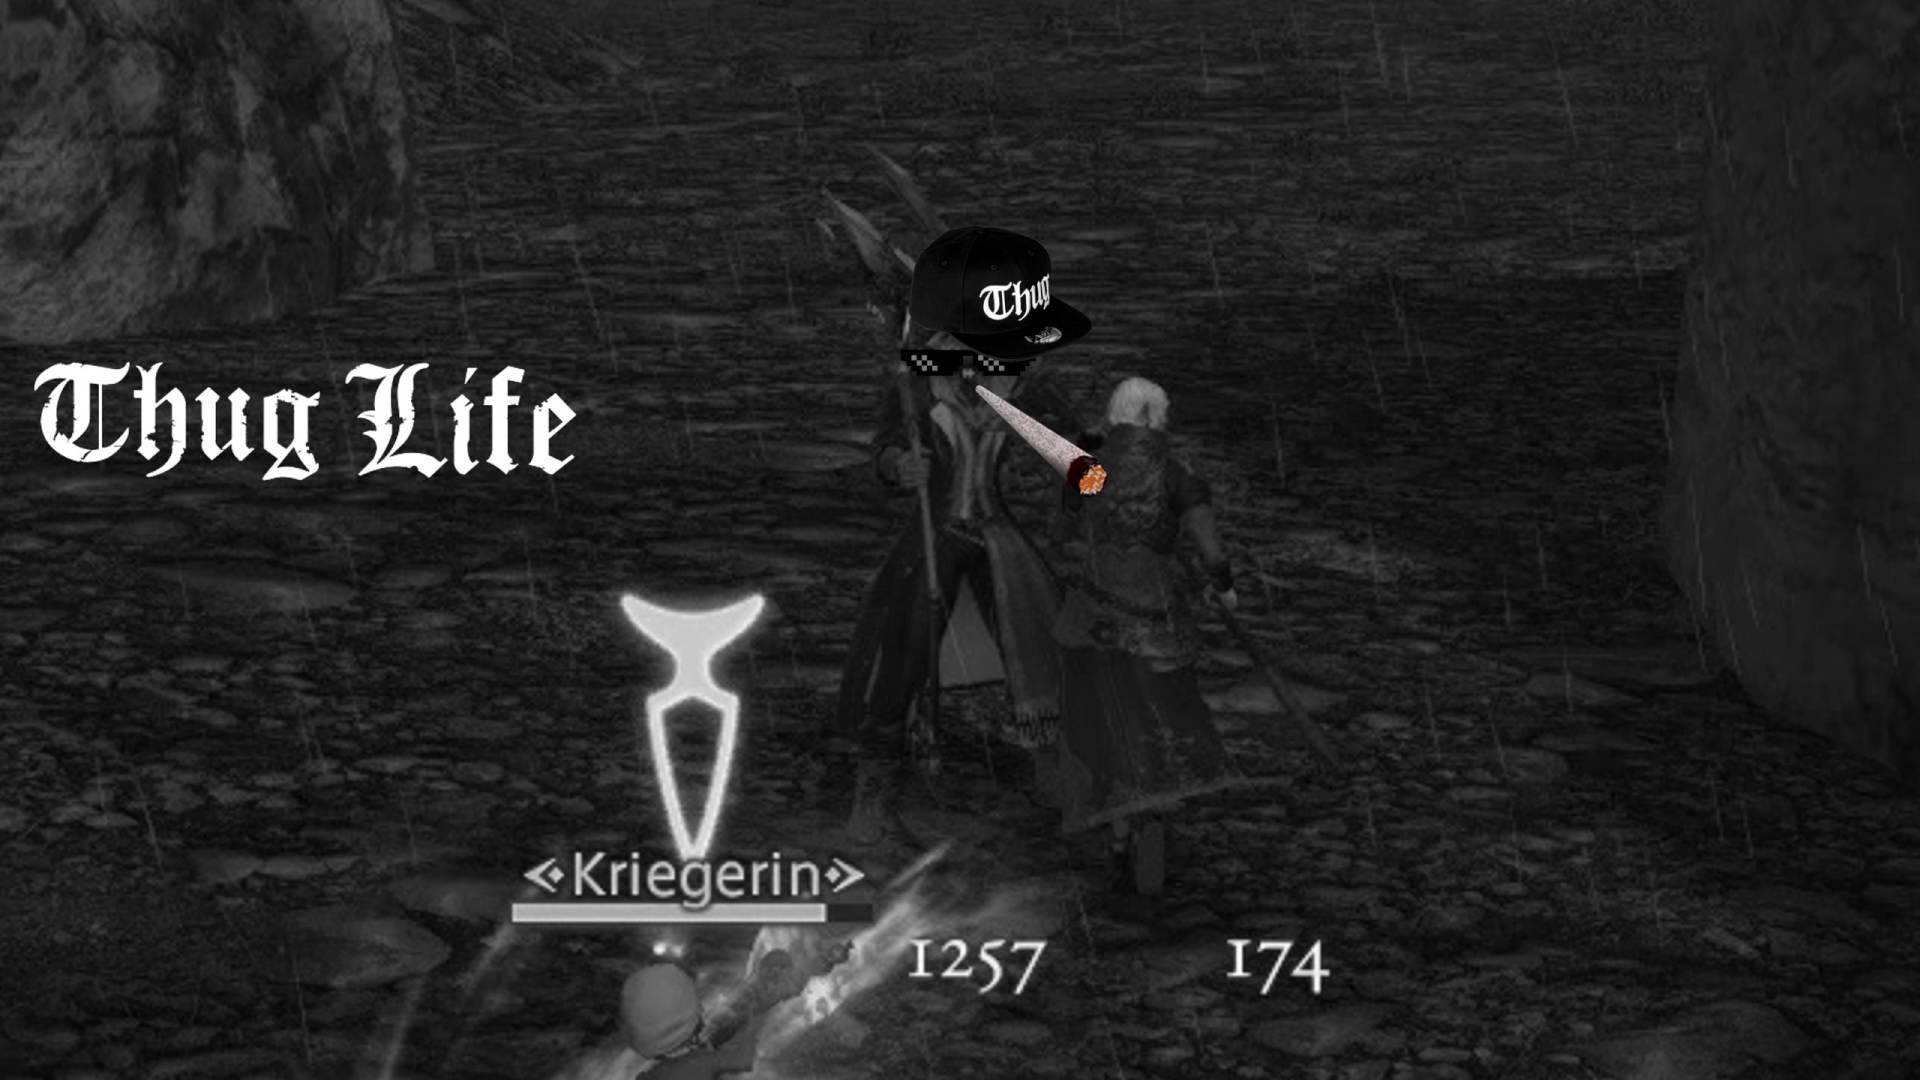 Final Fantasy XIV PvP Robbenholm [THUG LIFE]